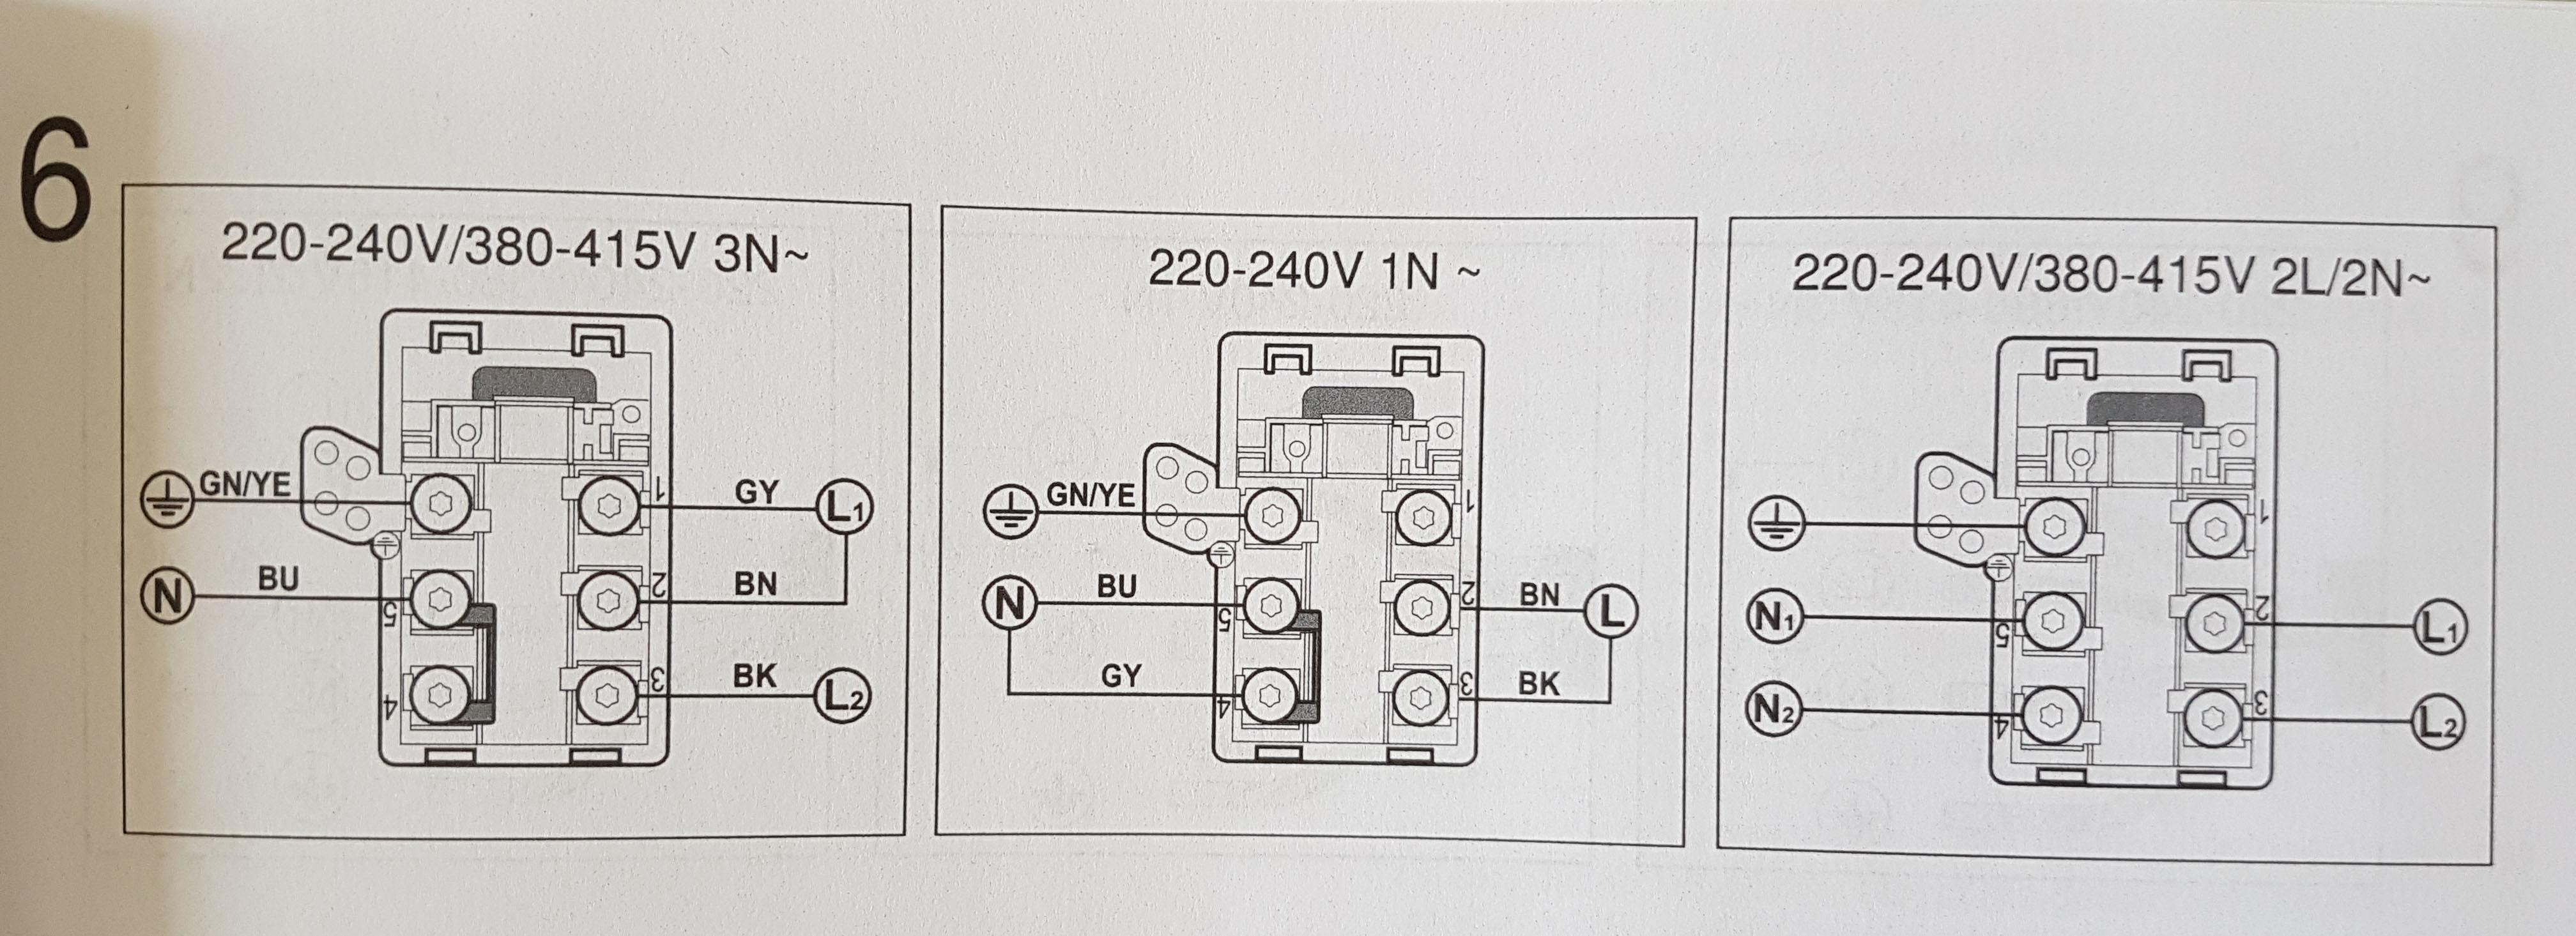 bosch kochfeld anschlie en technik einbauherd. Black Bedroom Furniture Sets. Home Design Ideas